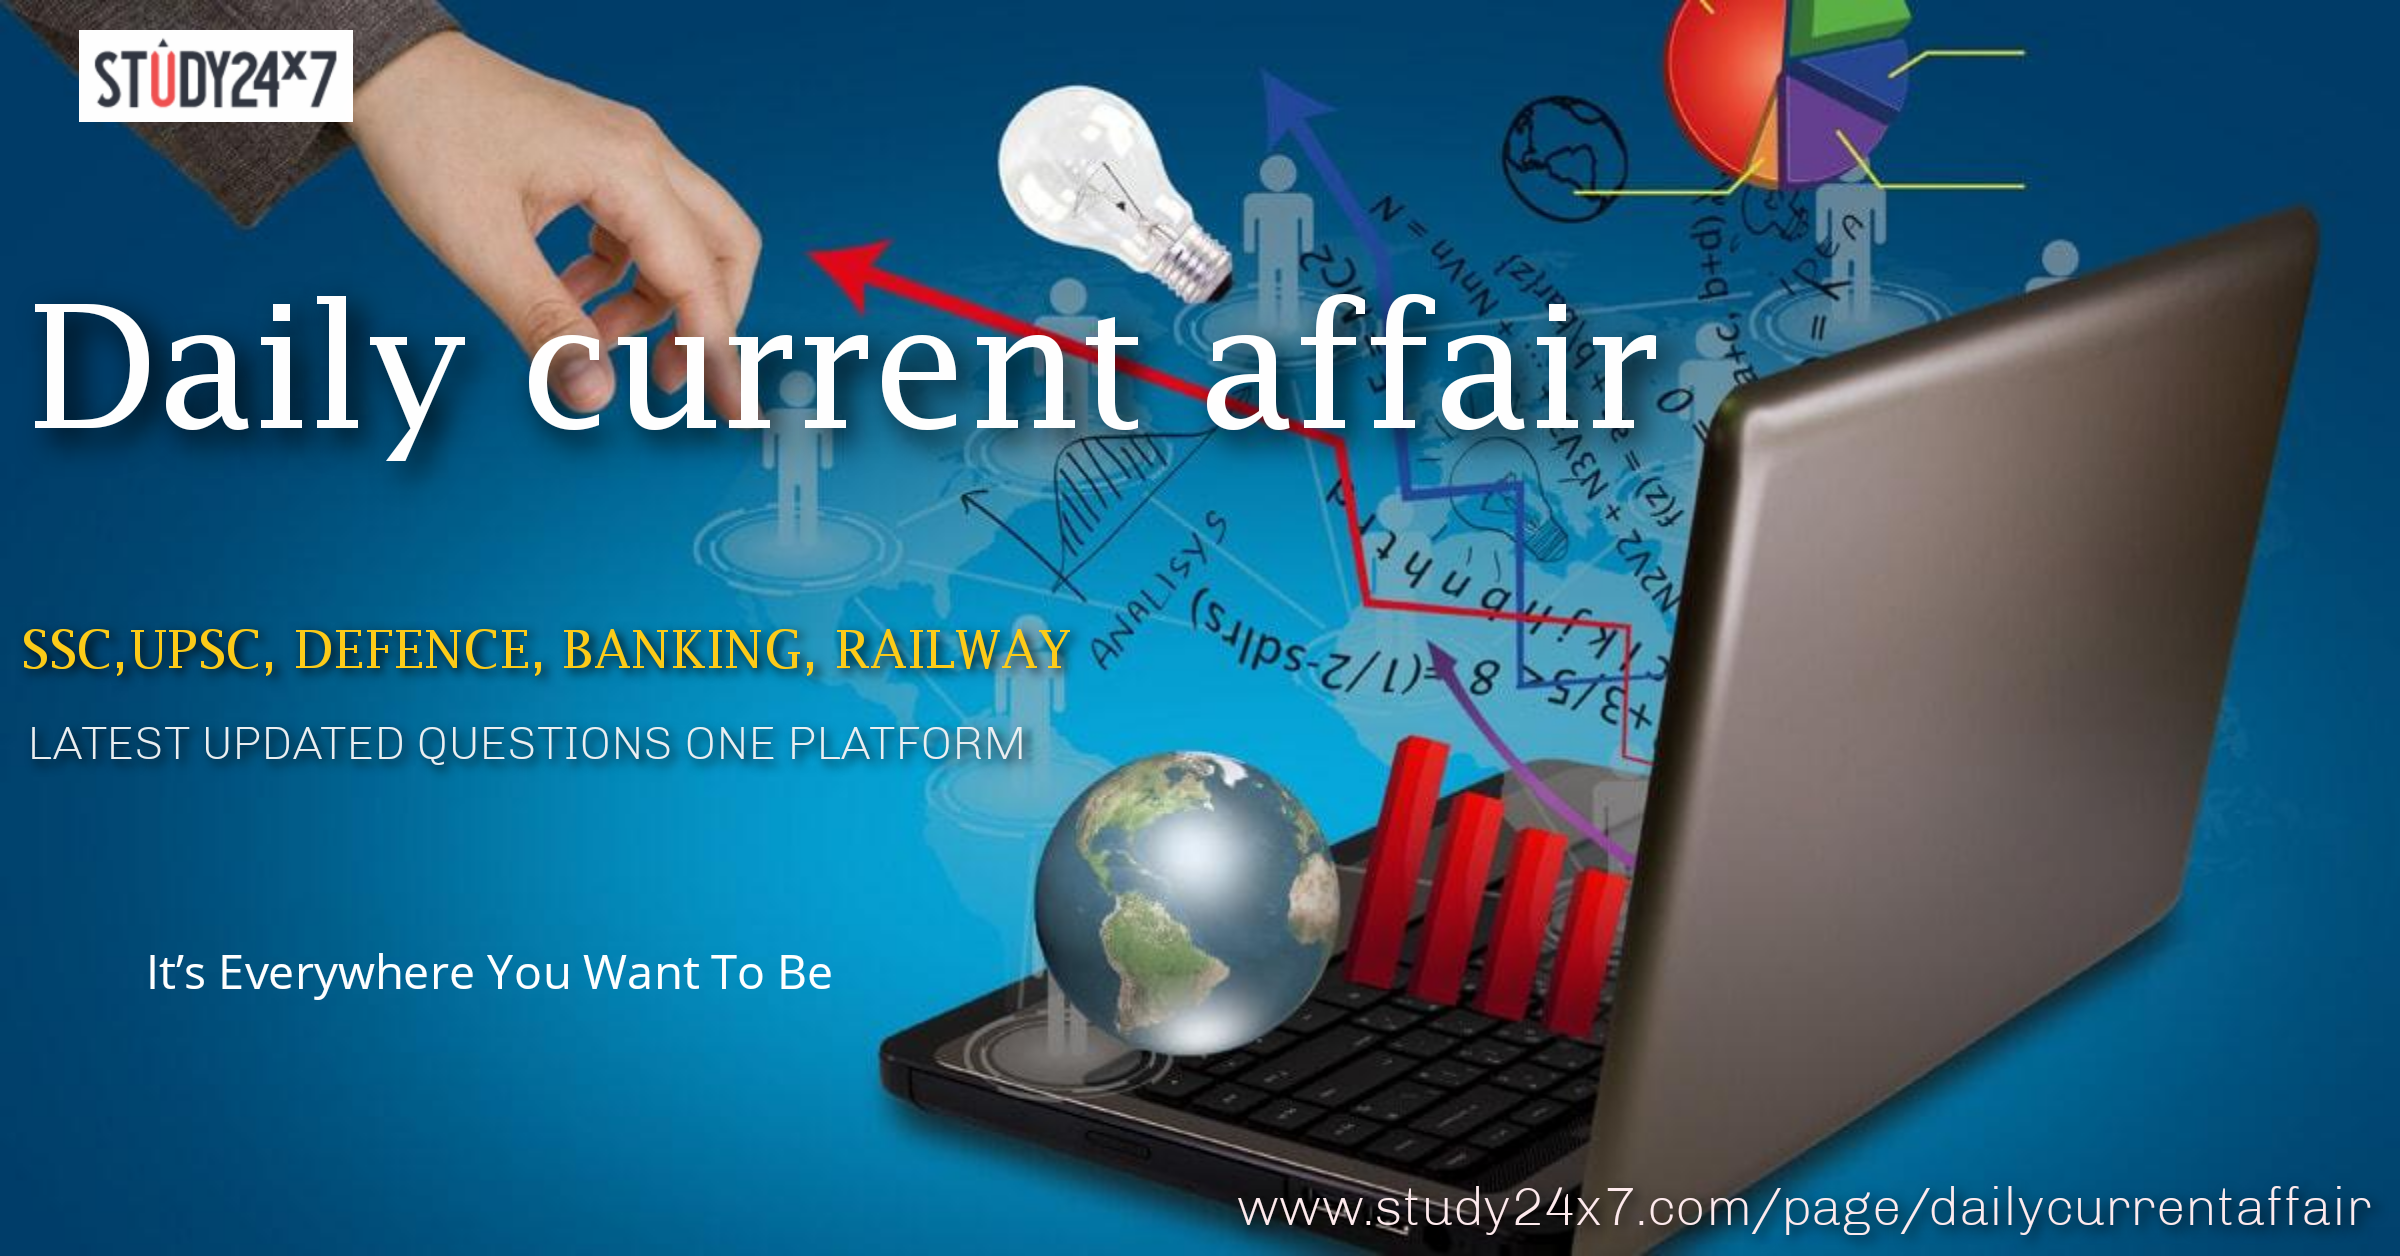 https://www.study24x7.com/article/1035/current-affair...